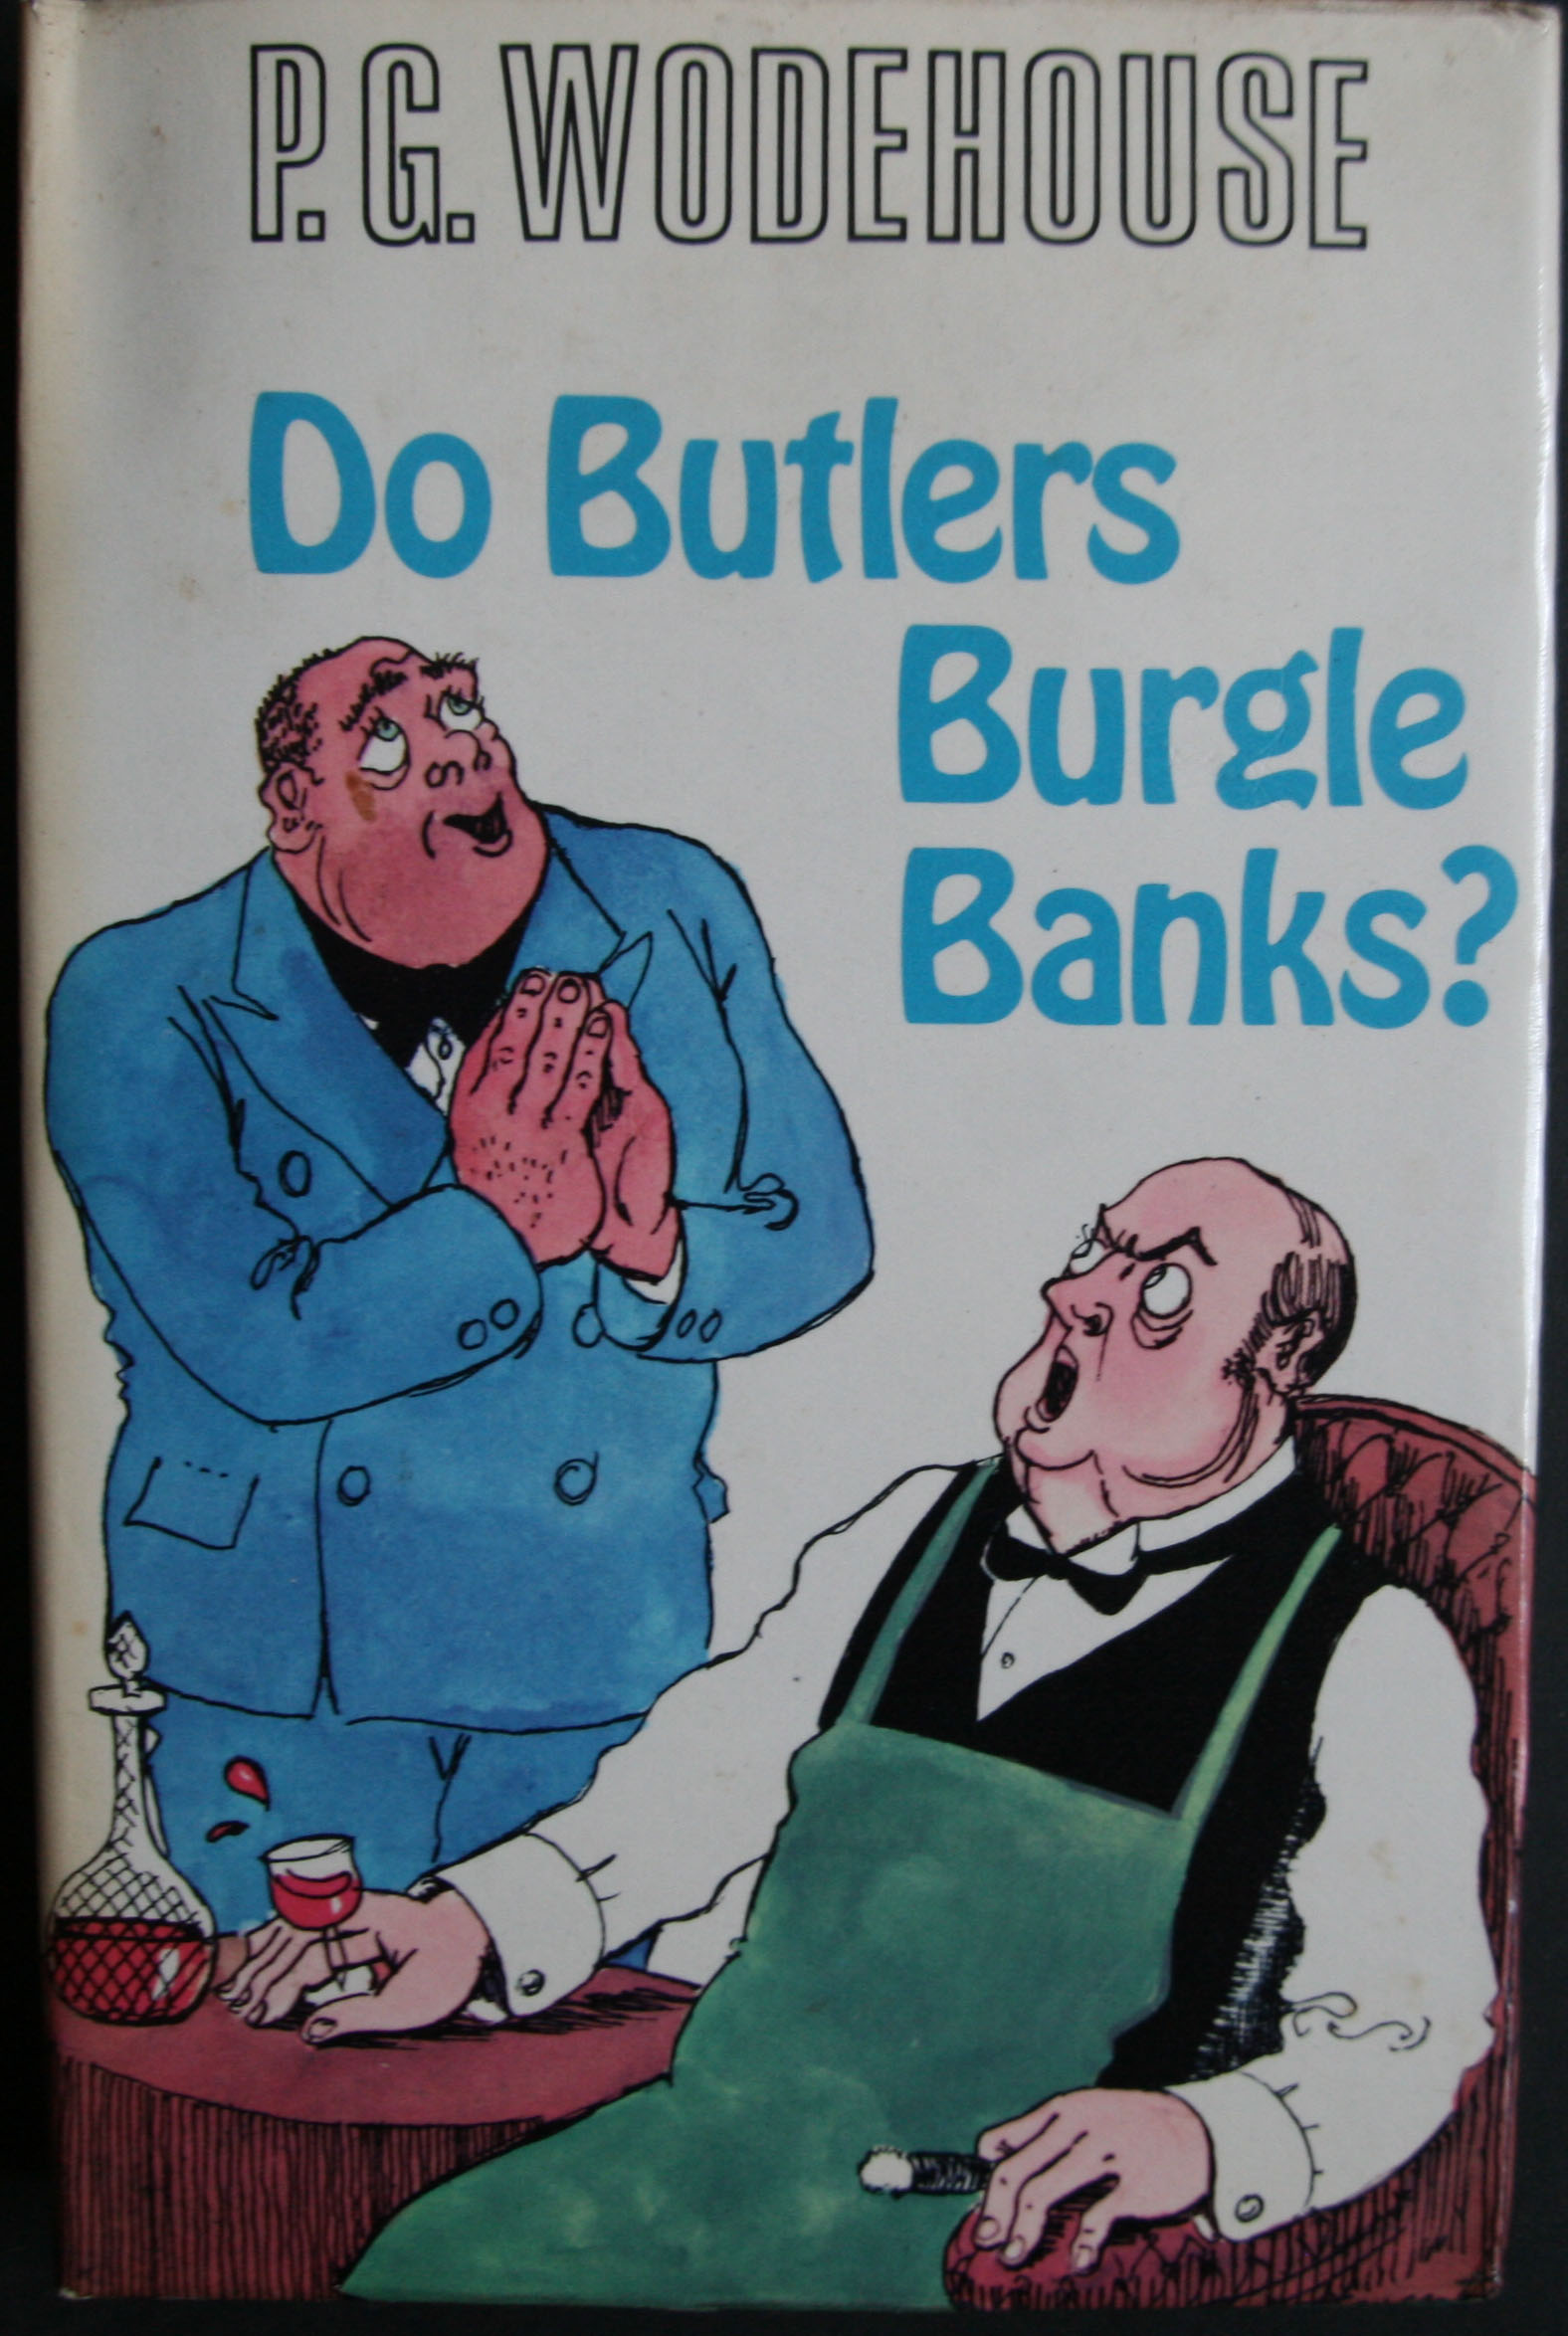 P G Wodehouse Do butlers burgle banks